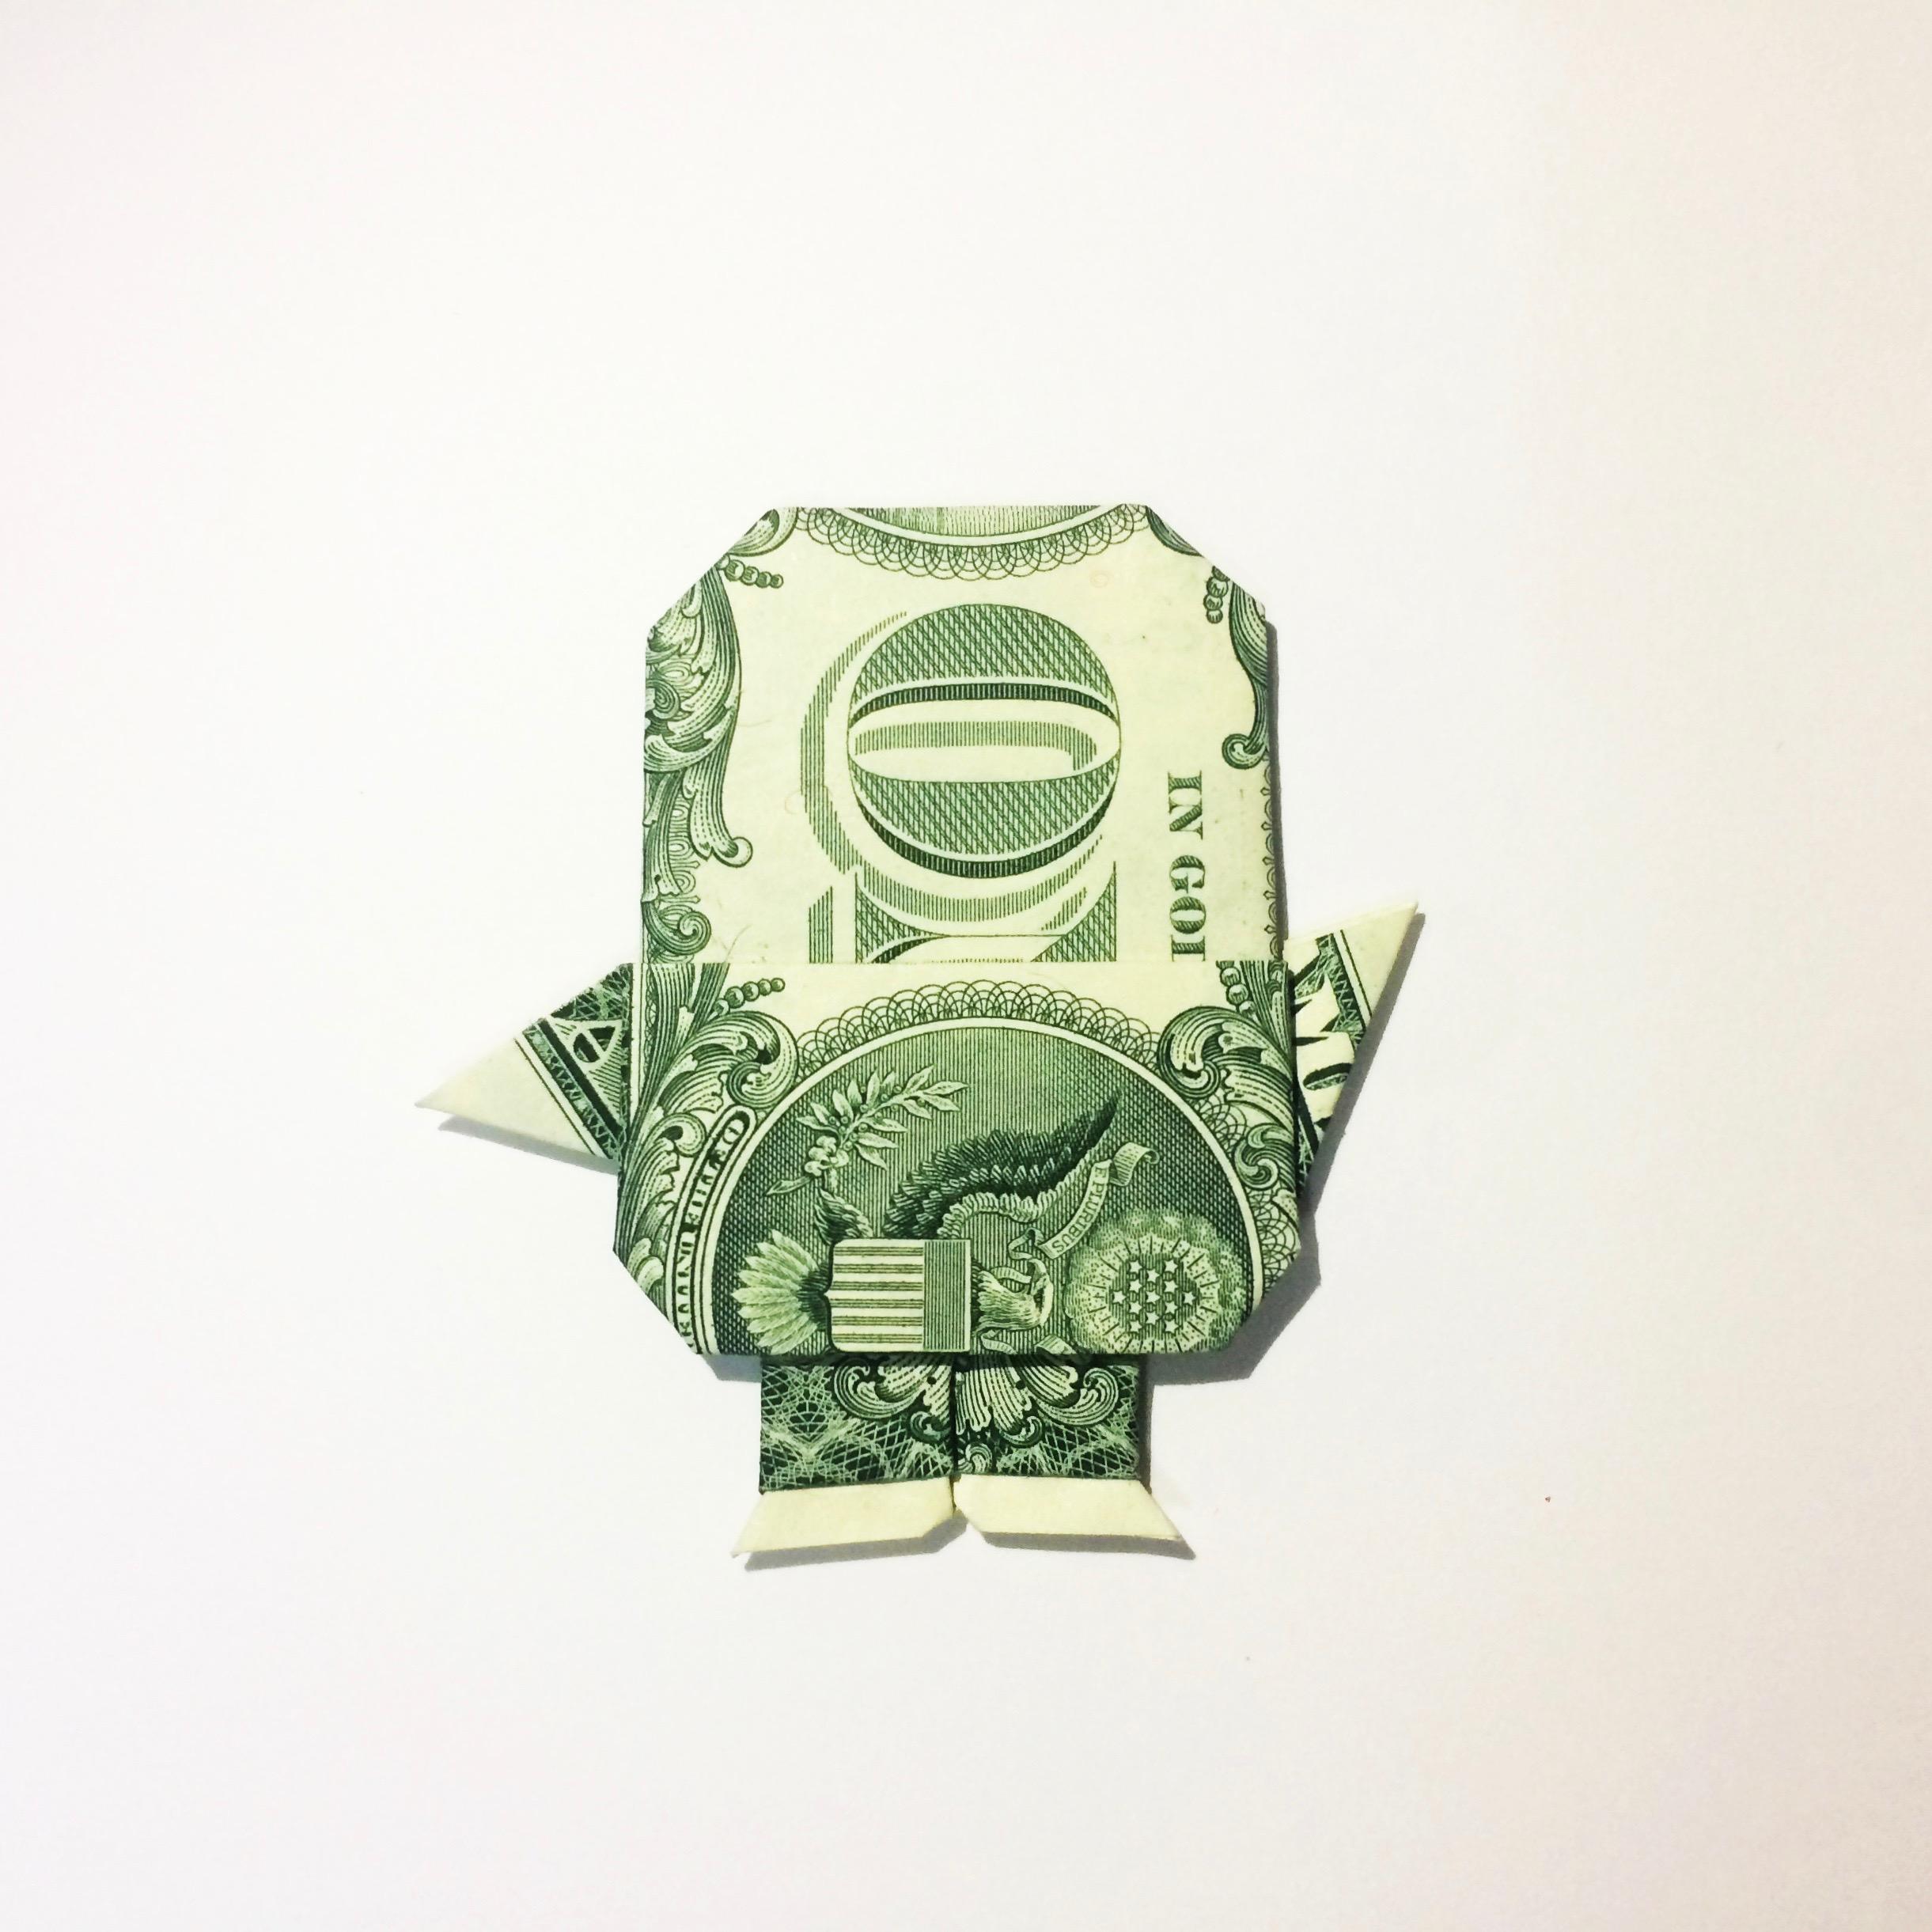 Origami Dollar Bill Design Minion Ryan Dong